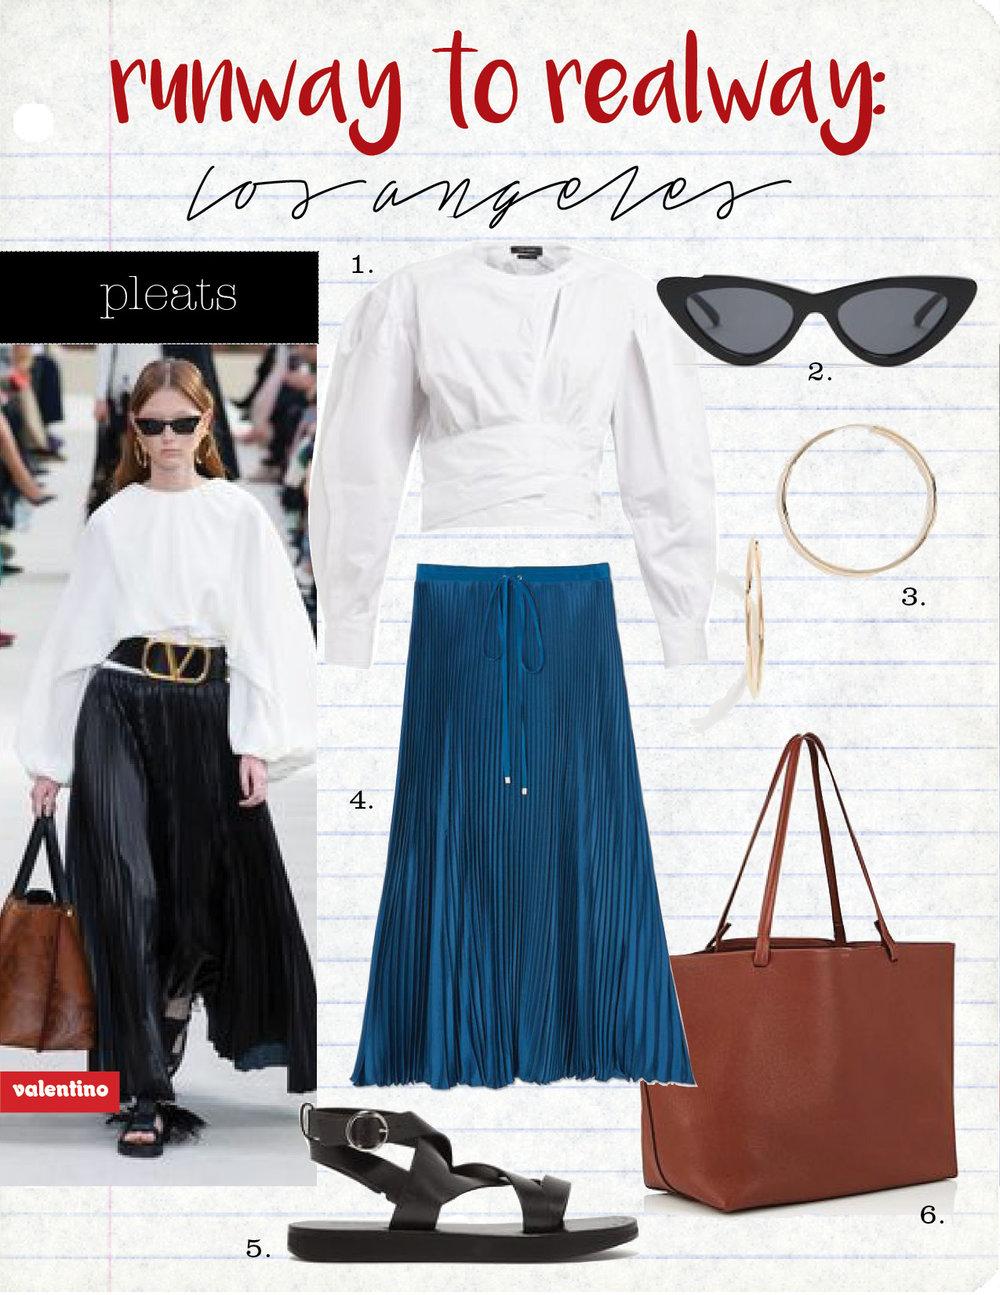 1. Isabel Marant cut-out cotton top, $515,  matchesfashion.com  2. le specs the last lolita cat-eye sunglasses, $80,  matchesfashion.com  3. shashi samantha small hoop earrings, $46,  shopbop.com  4. tibi mendini twill pleated skirt, $595,  goop.com  5. Isabel Marant noelly leather sandals, $680,  matchesfashion.com  6. the row park leather tote bag, $1790,  barneys.com